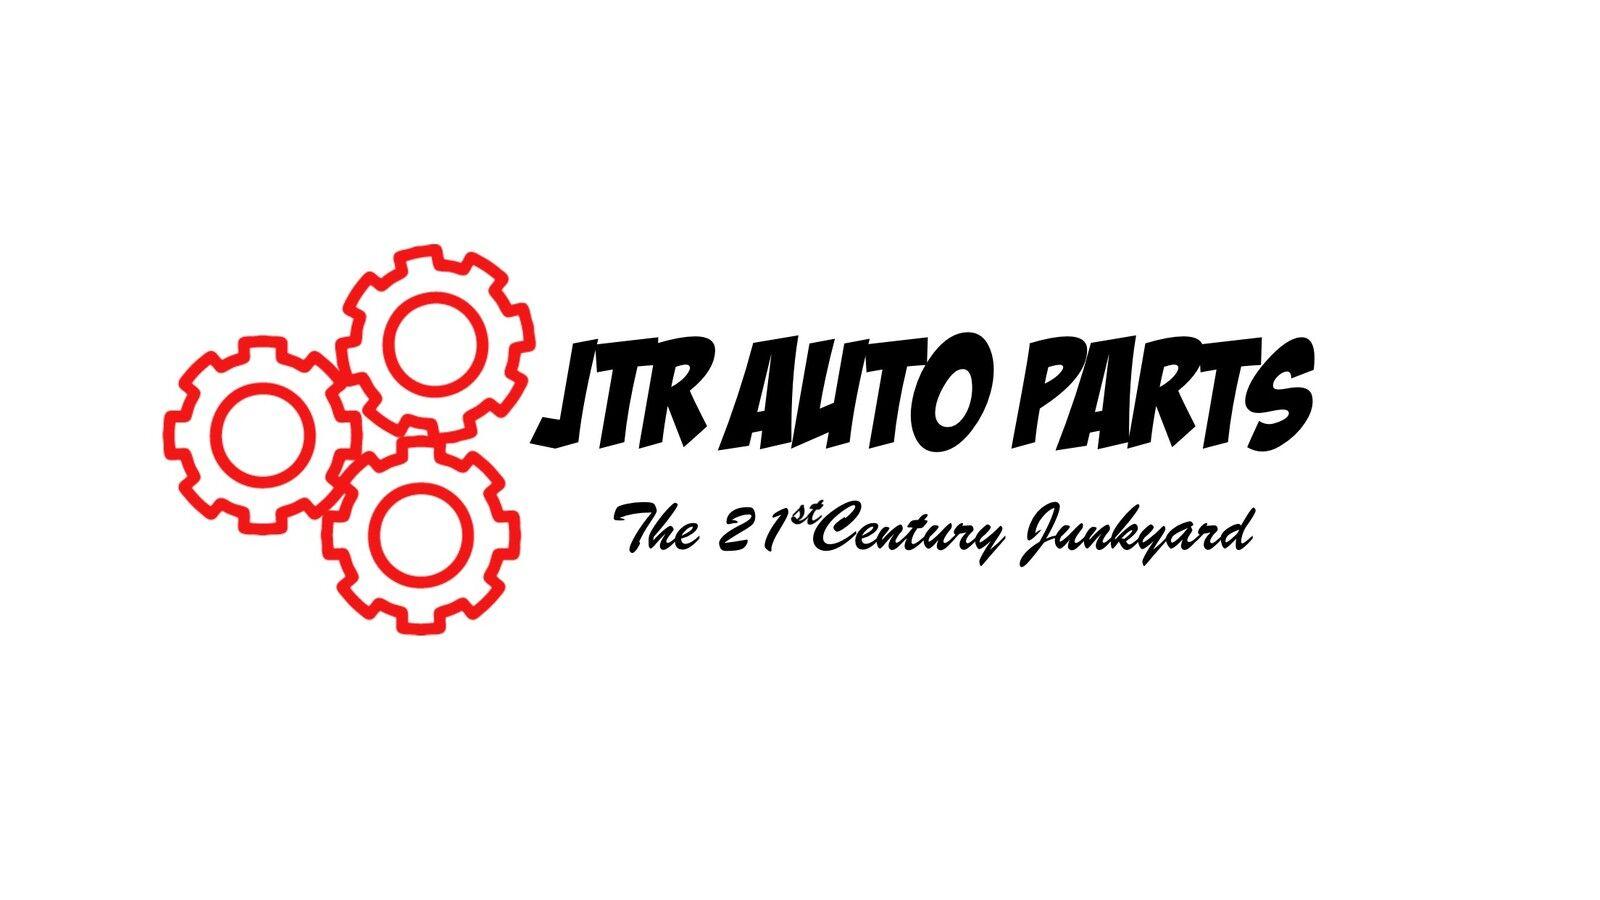 JTR Auto Parts